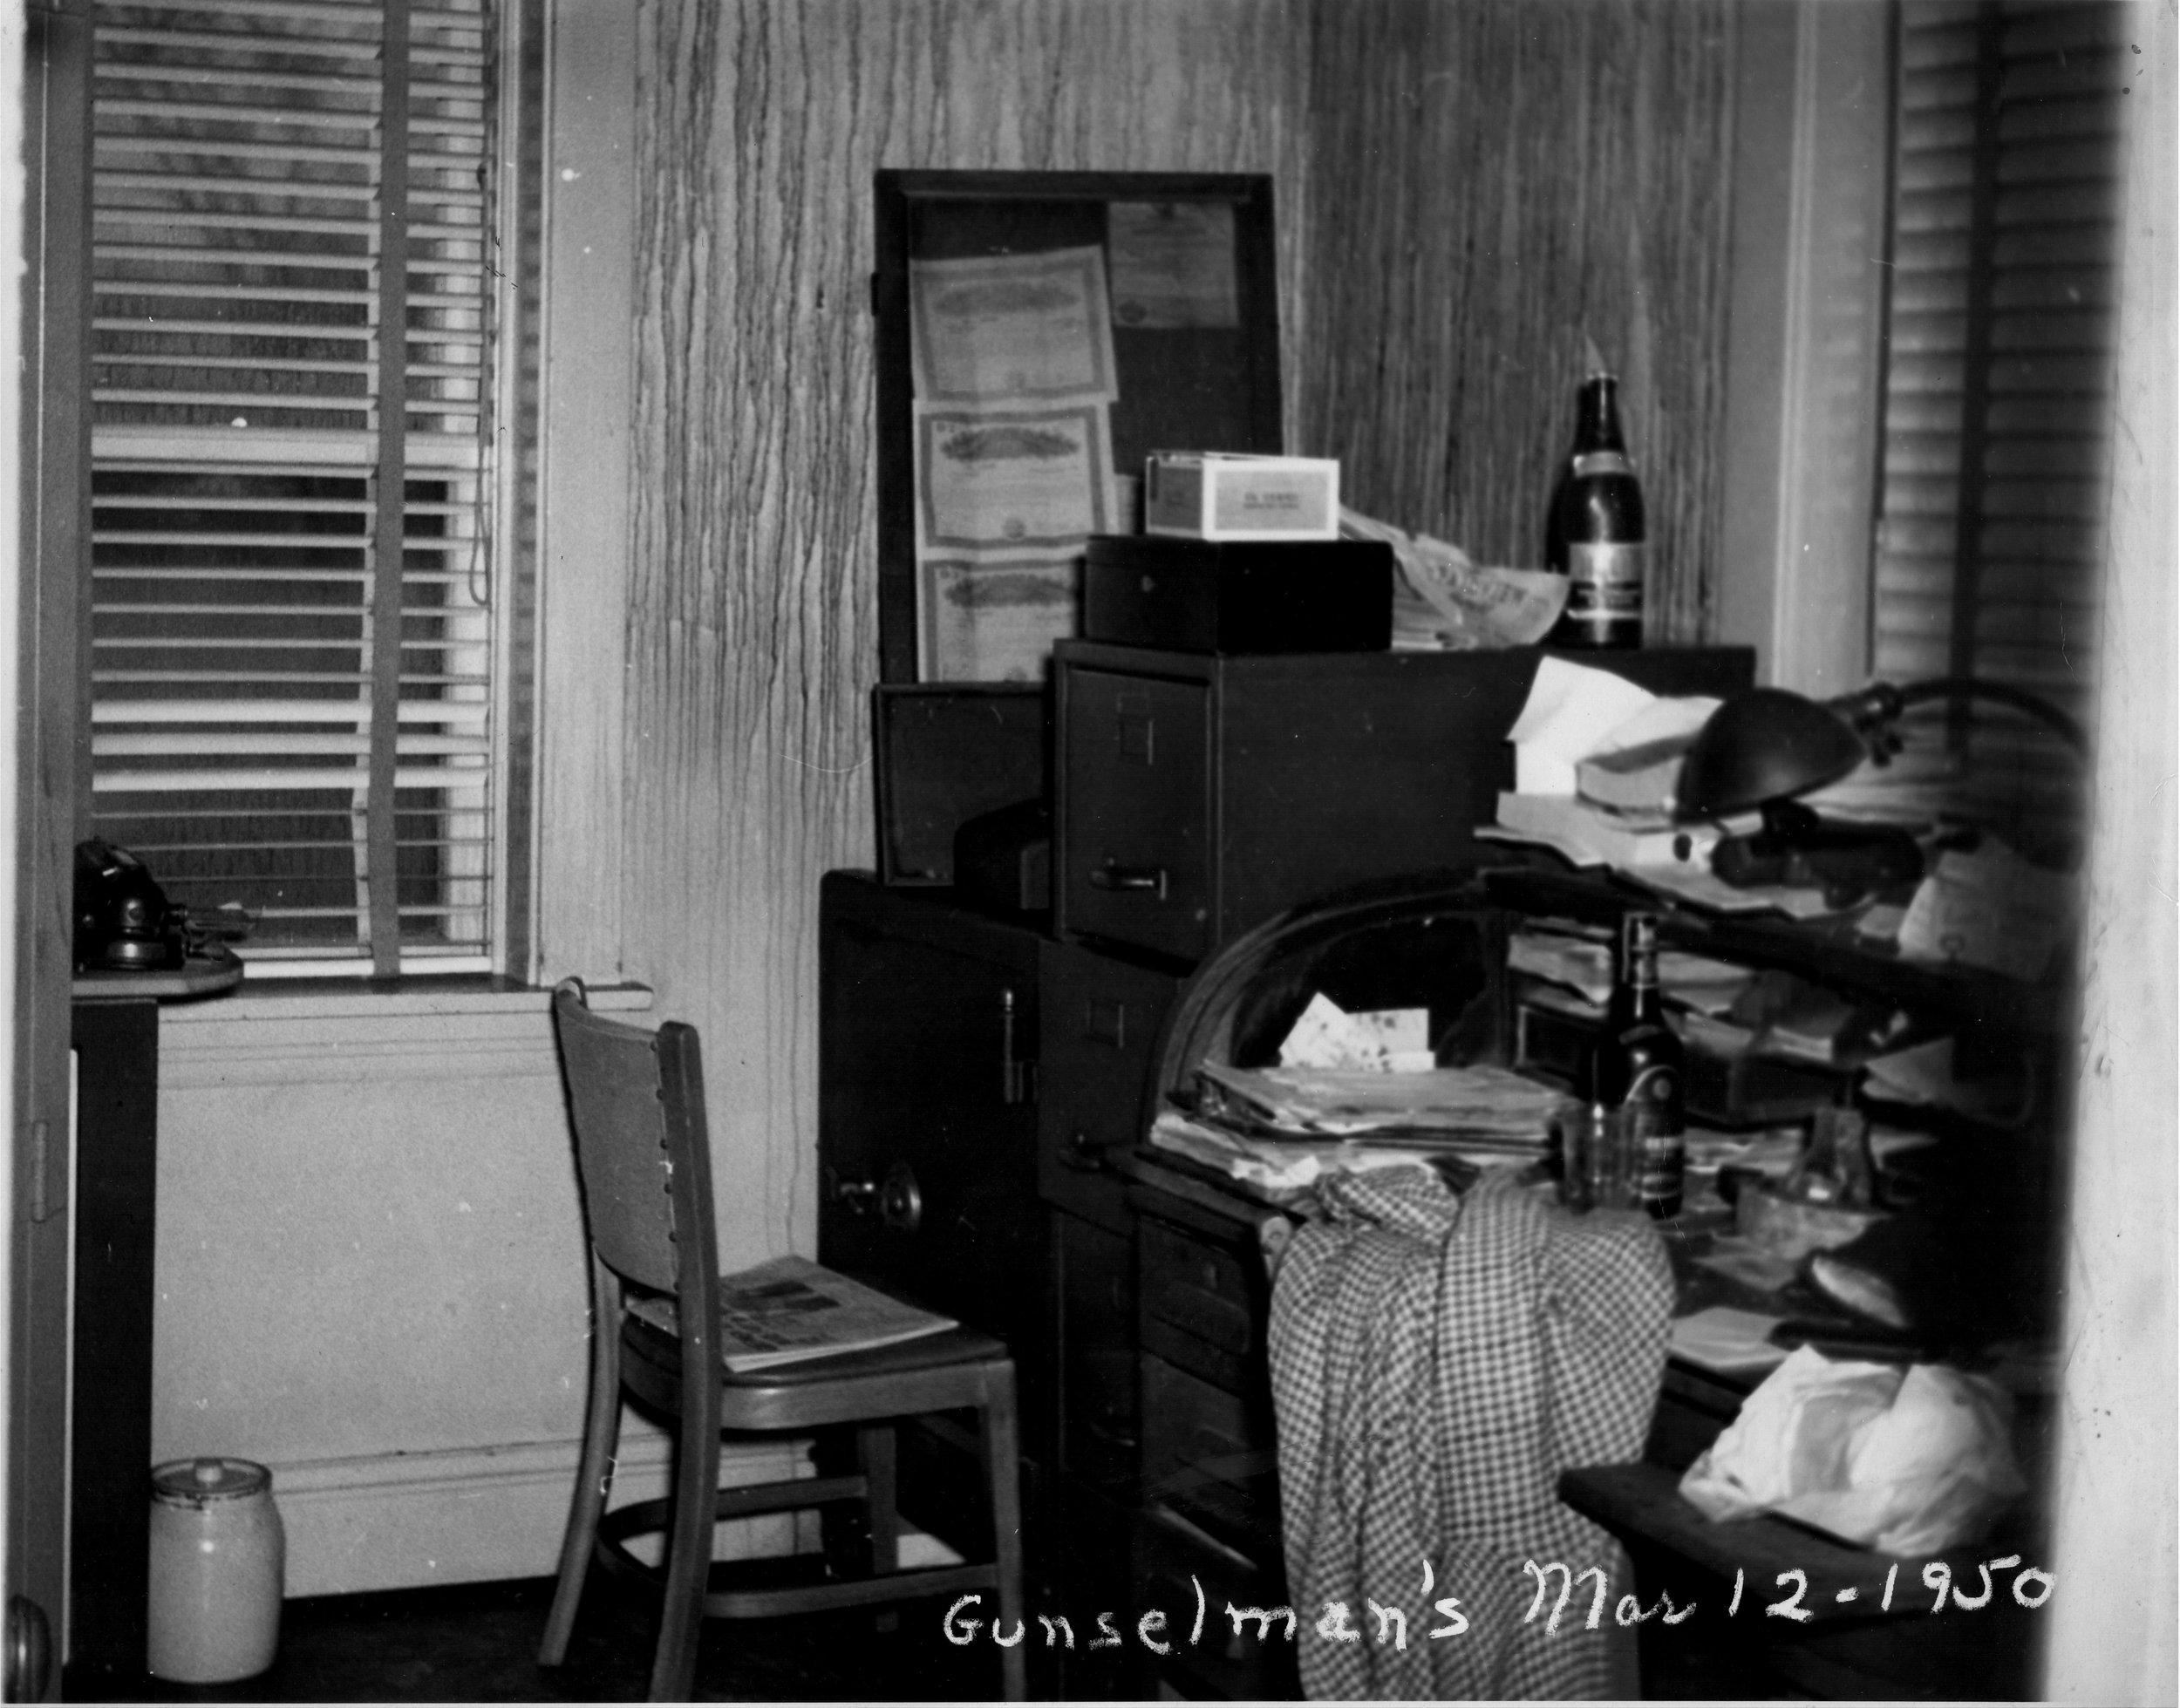 Gunselman-Tavern-office.jpg